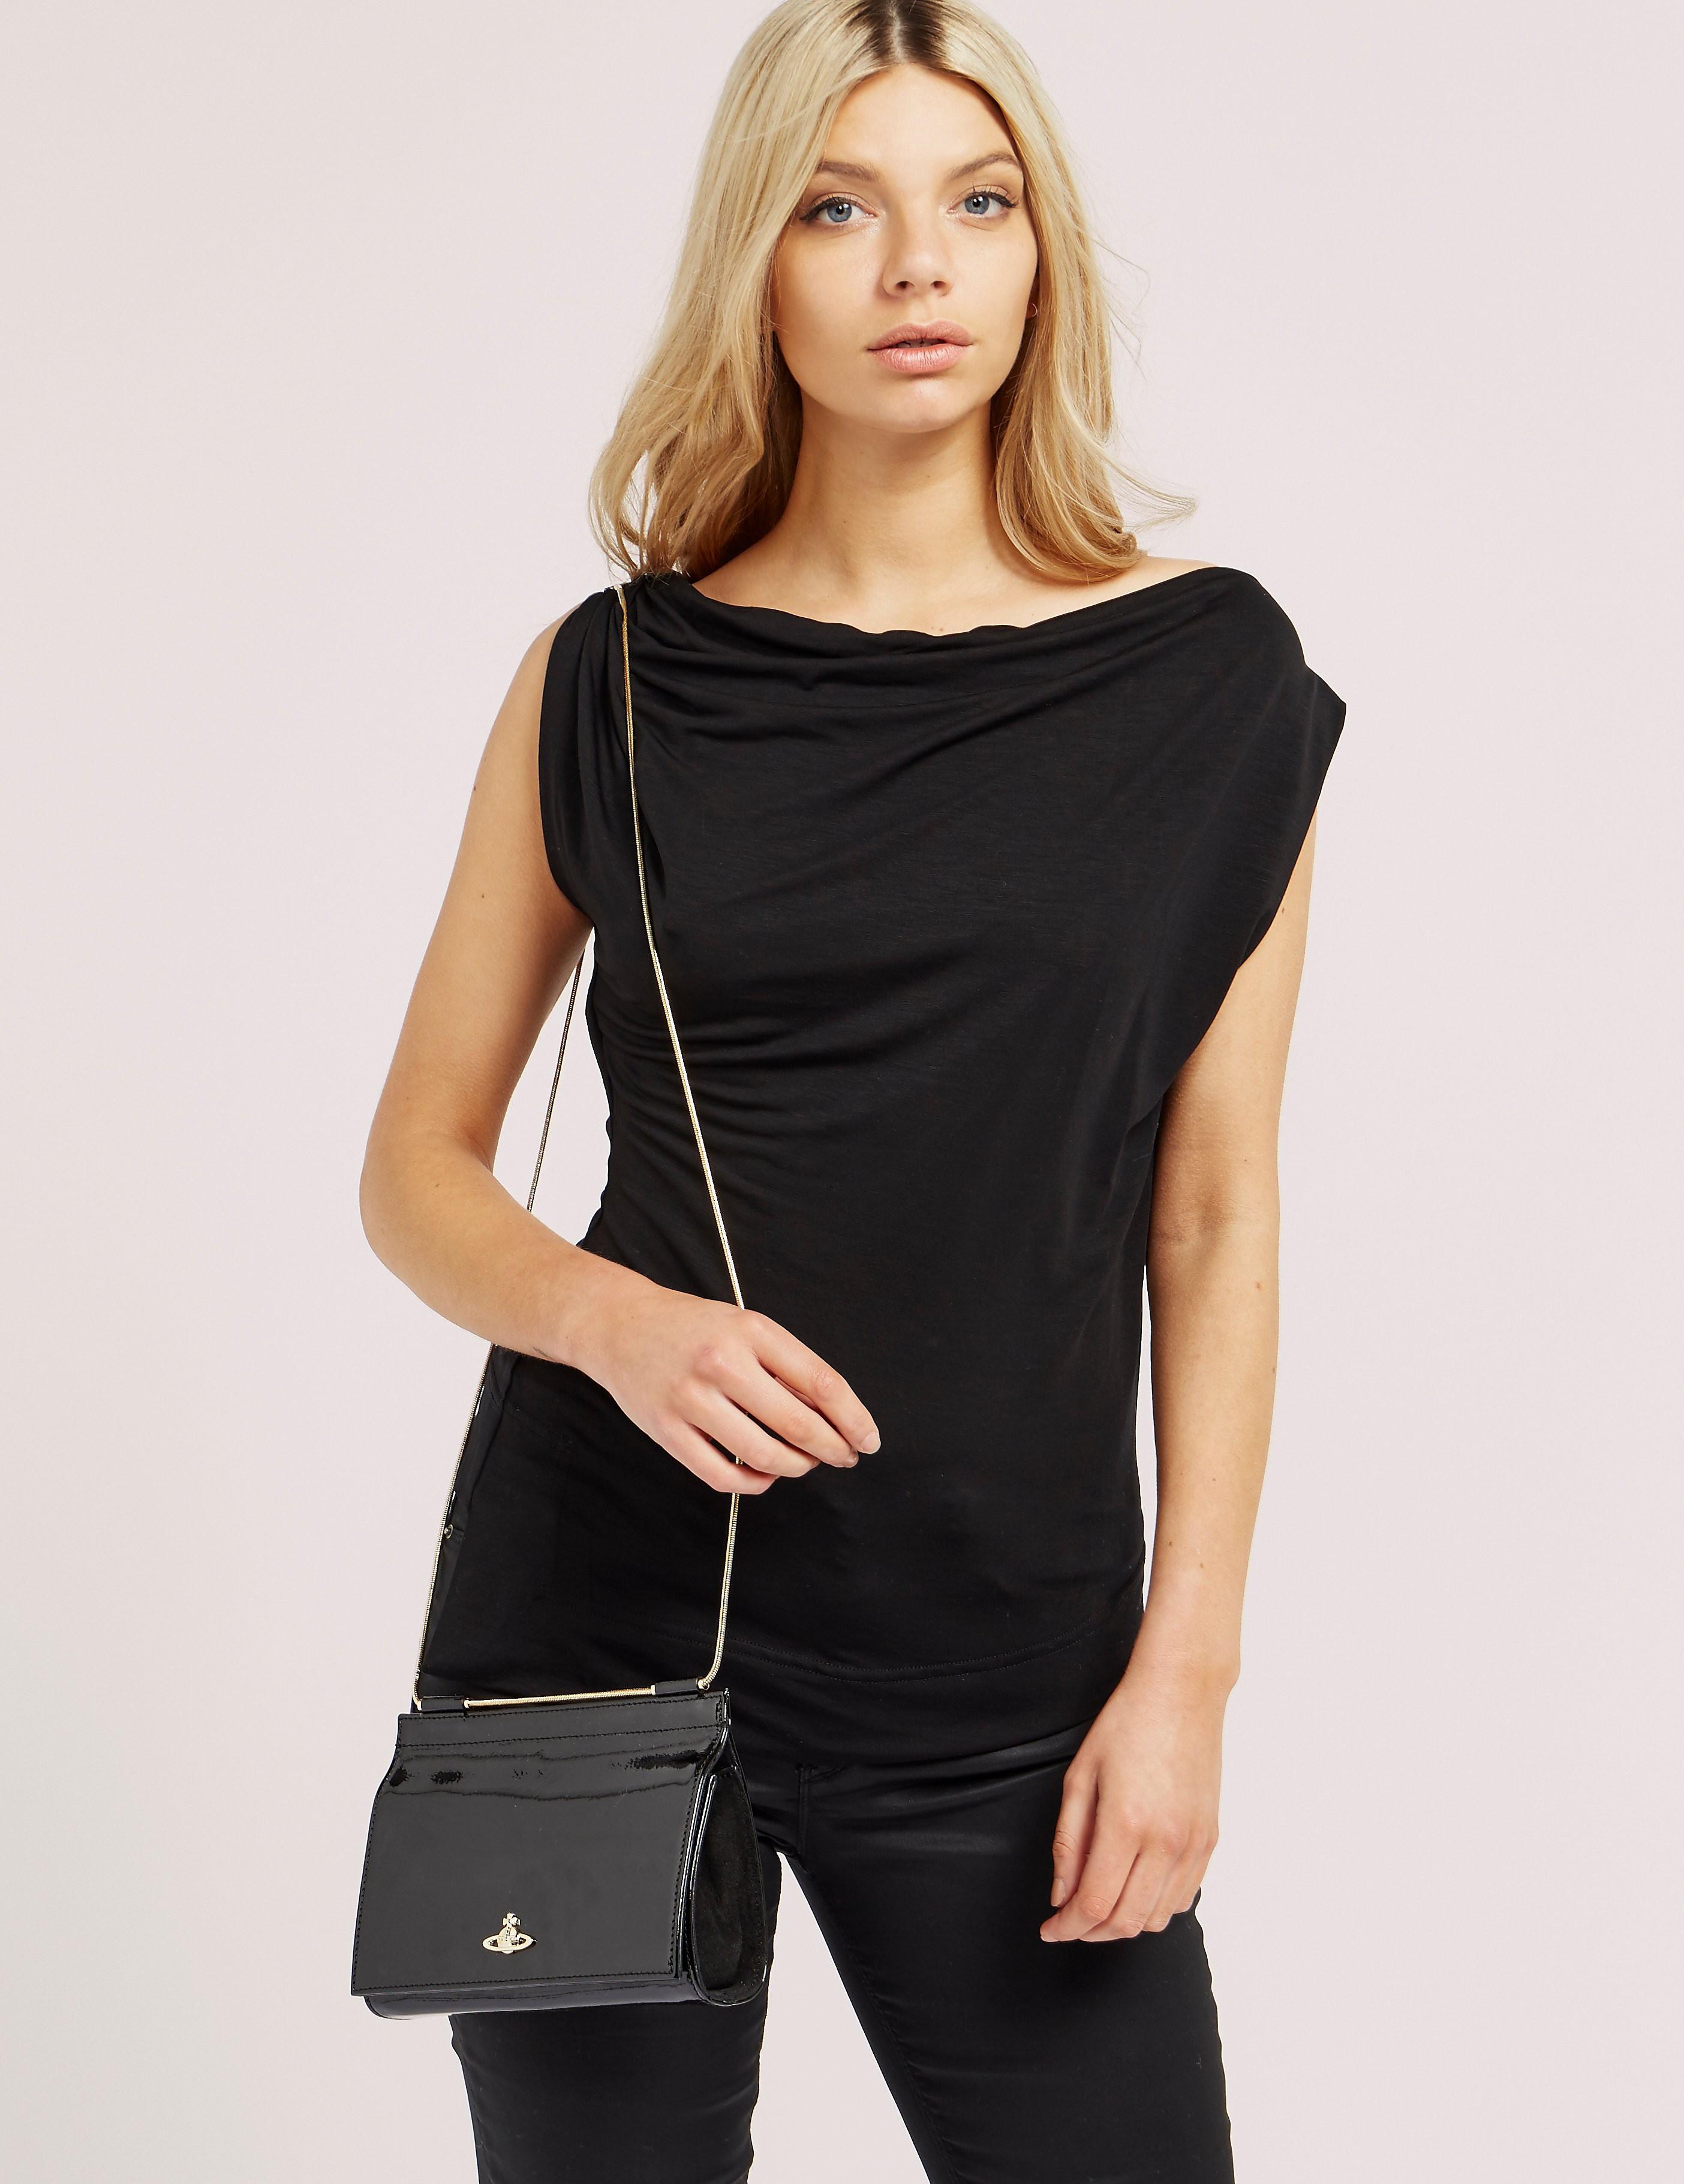 Vivienne Westwood Margate Crossbody Bag